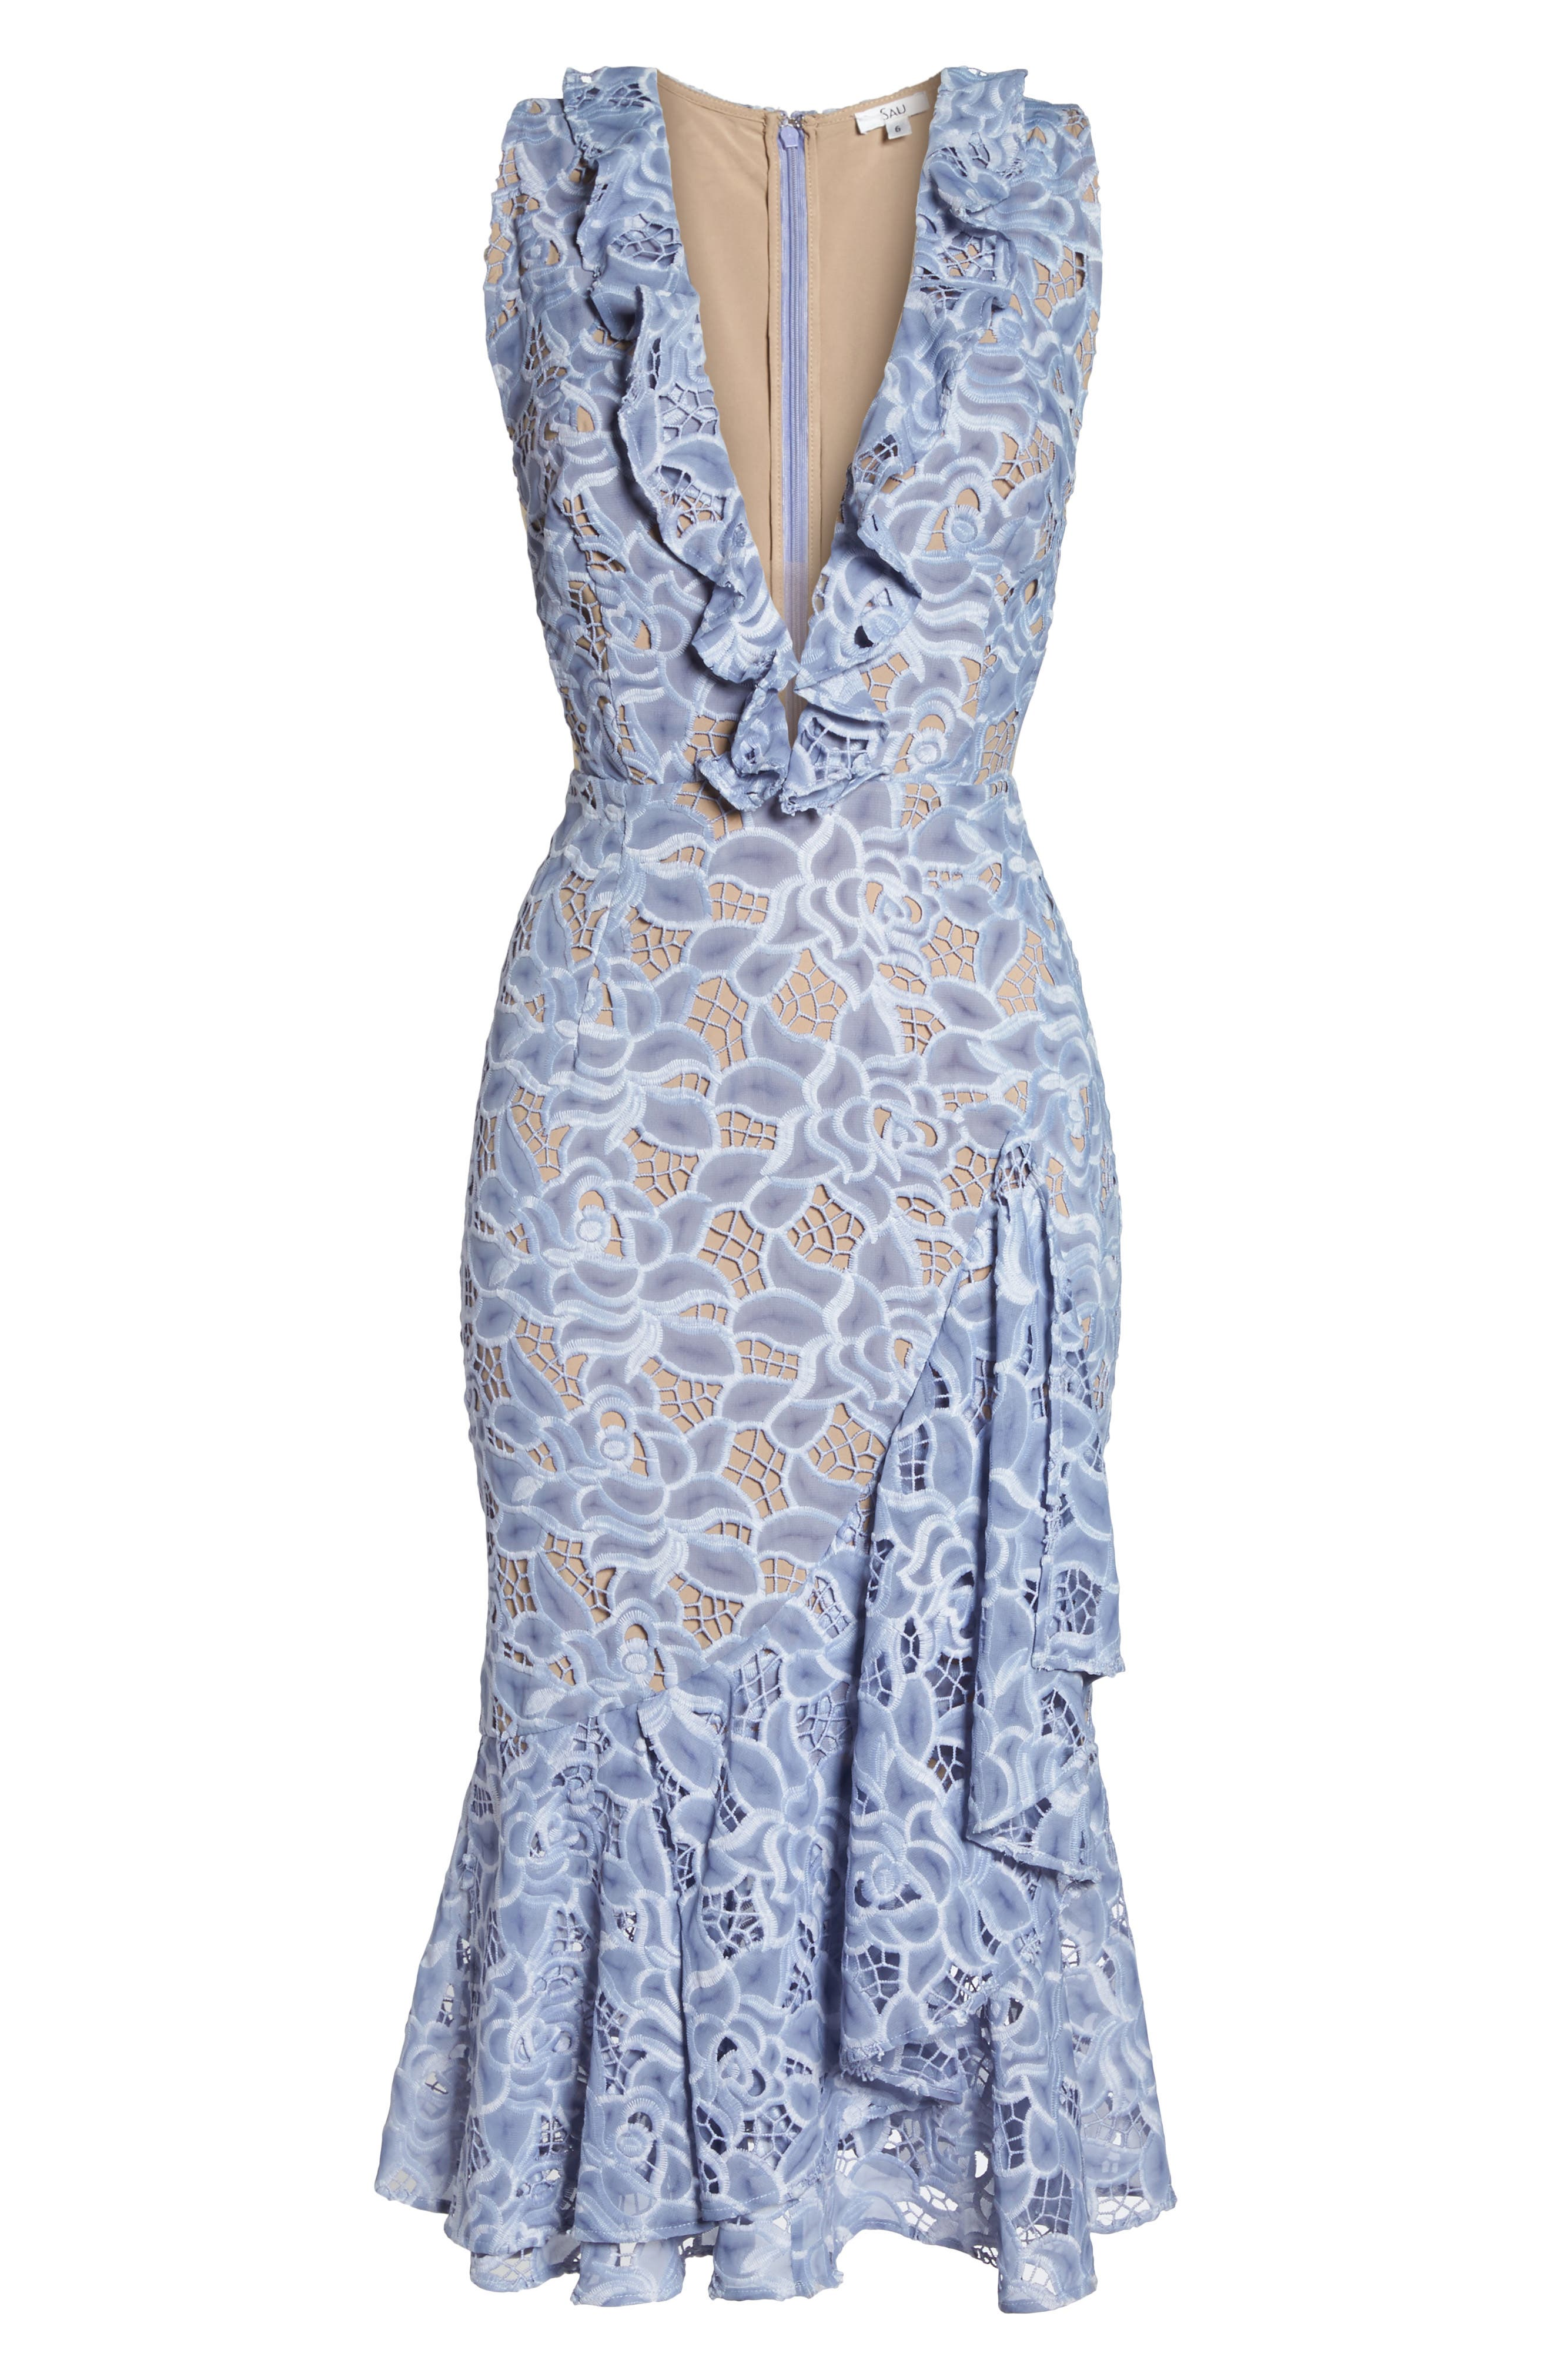 Amelia Ruffle Lace Dress,                             Alternate thumbnail 6, color,                             Cornflower Blue